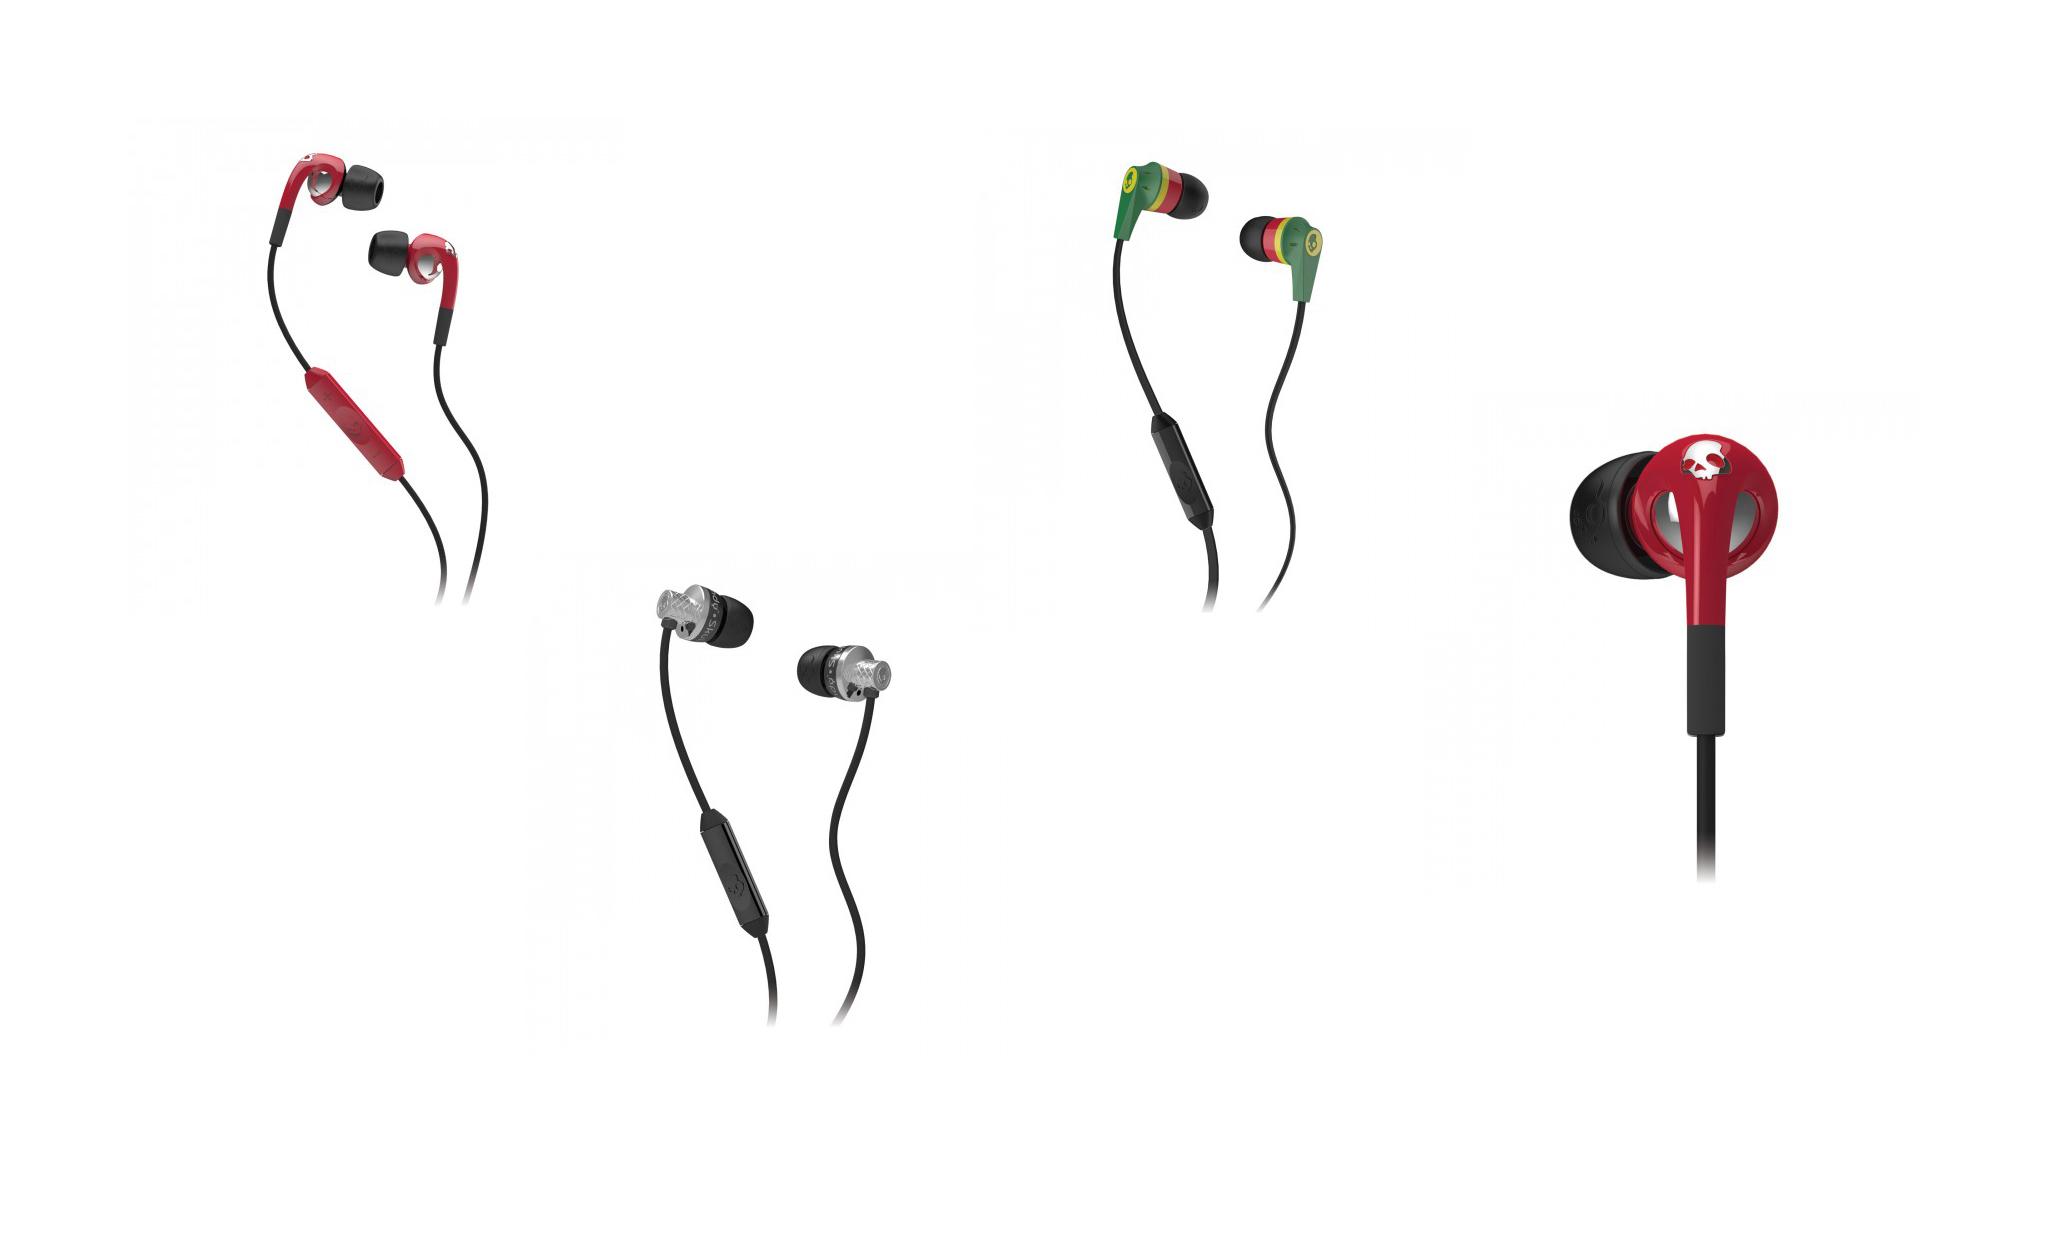 Headphones: Skullcandy Fix In-Ear with Mic